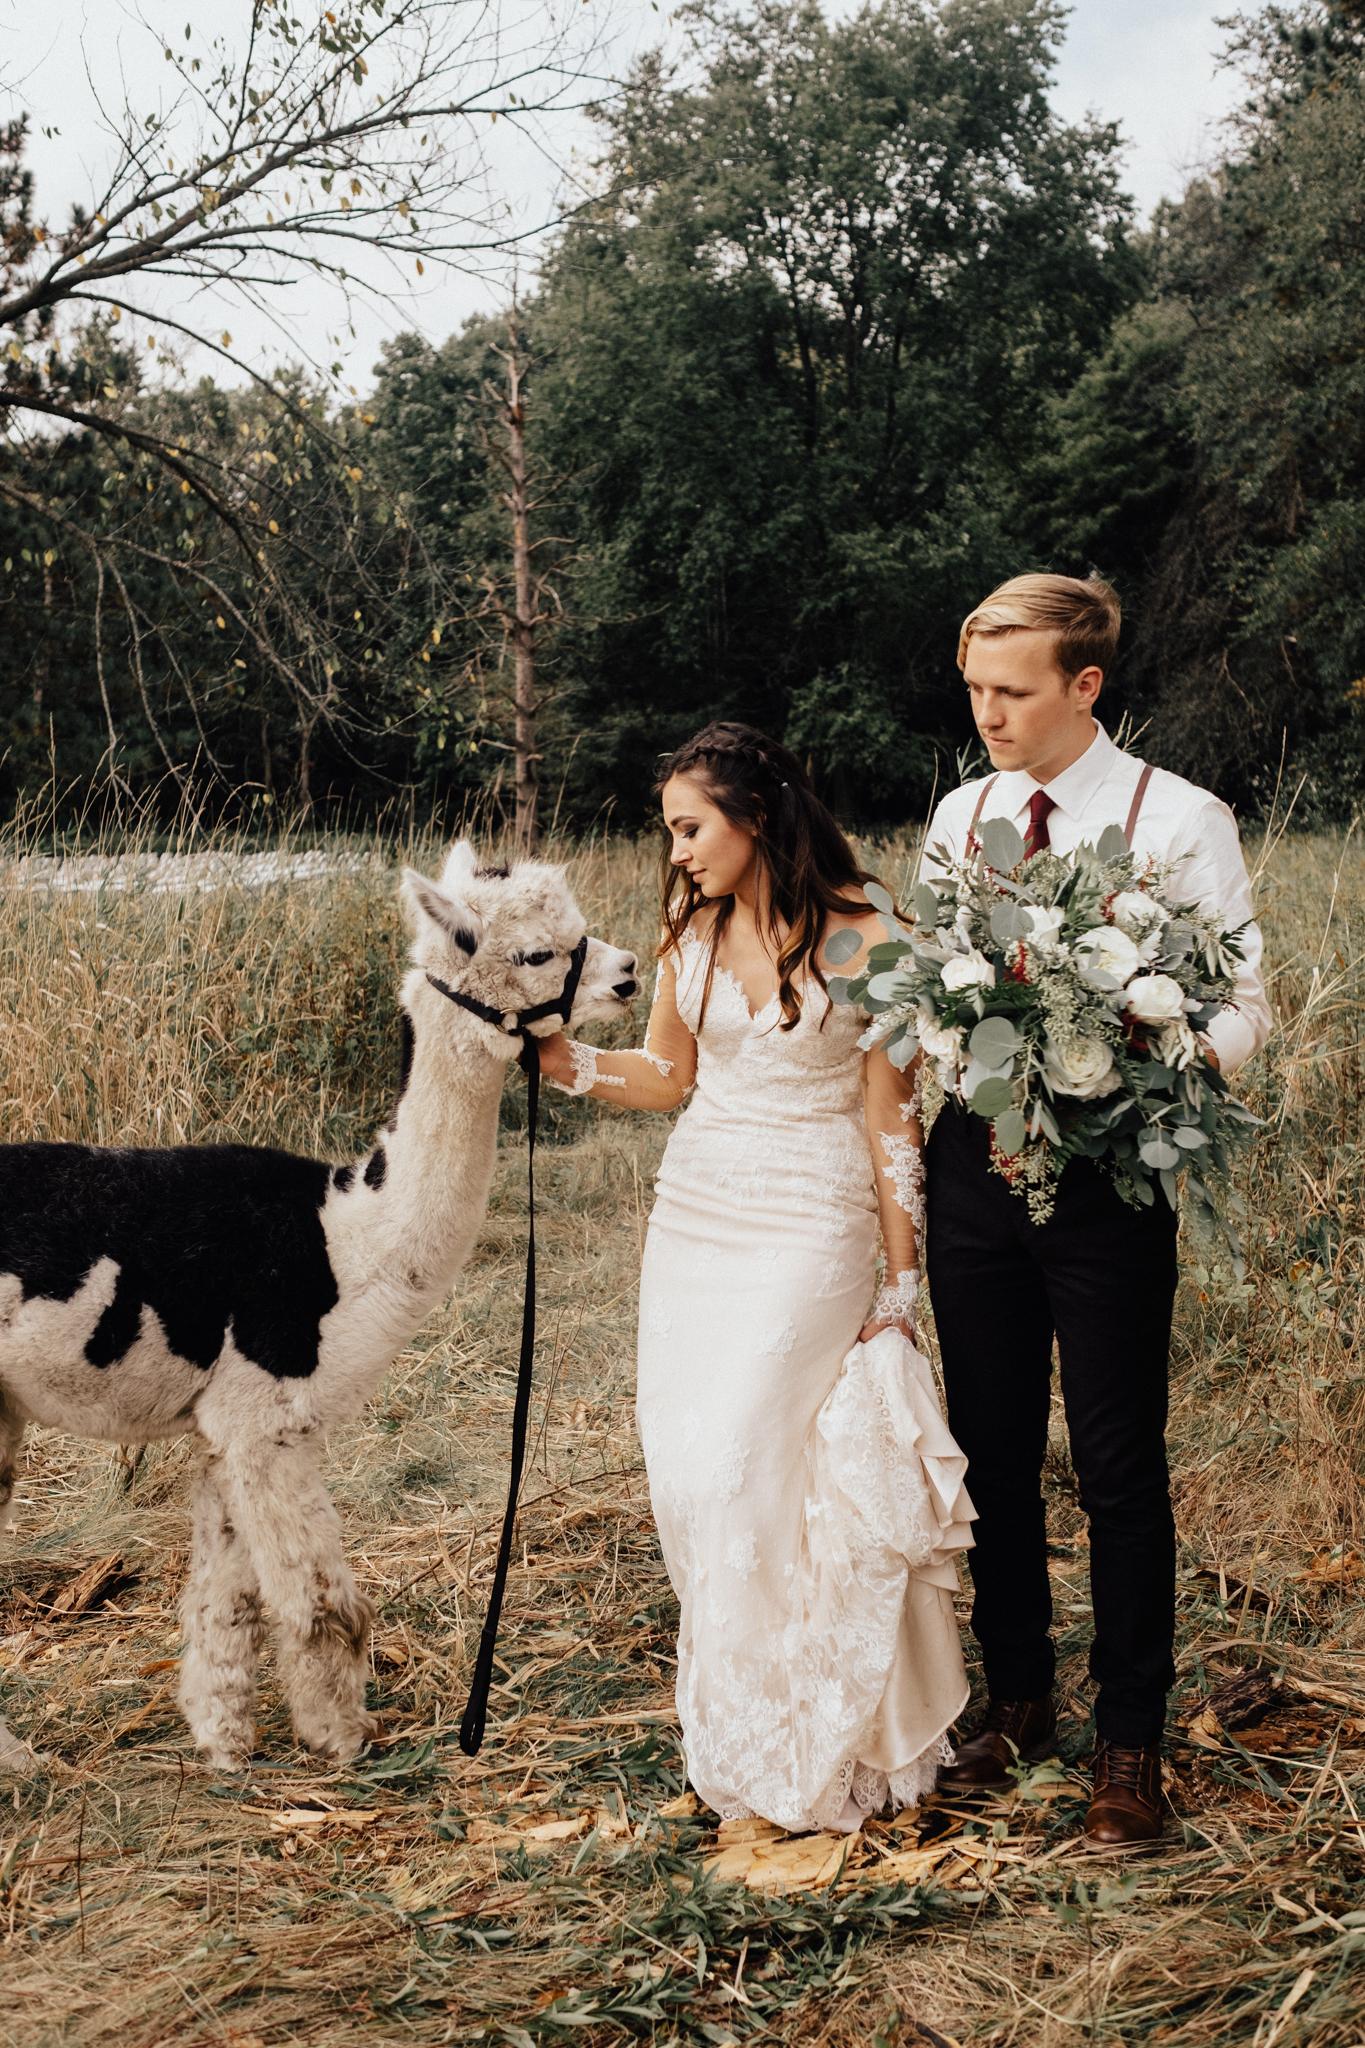 Arizona-Adventure-Elopement-Wedding-Photographer-54.jpg